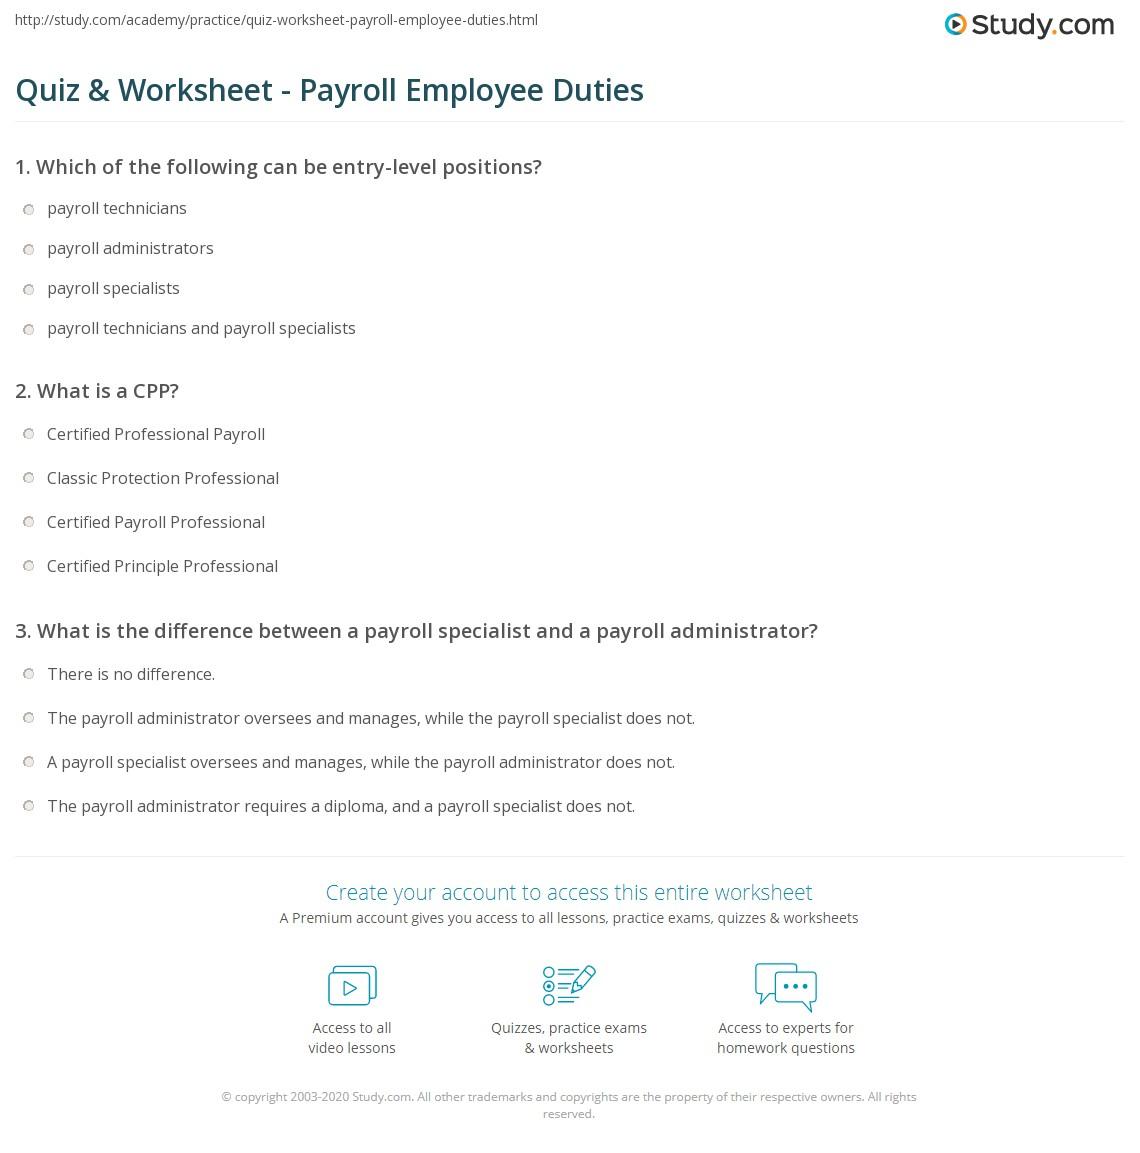 print payroll staff roles responsibilities worksheet